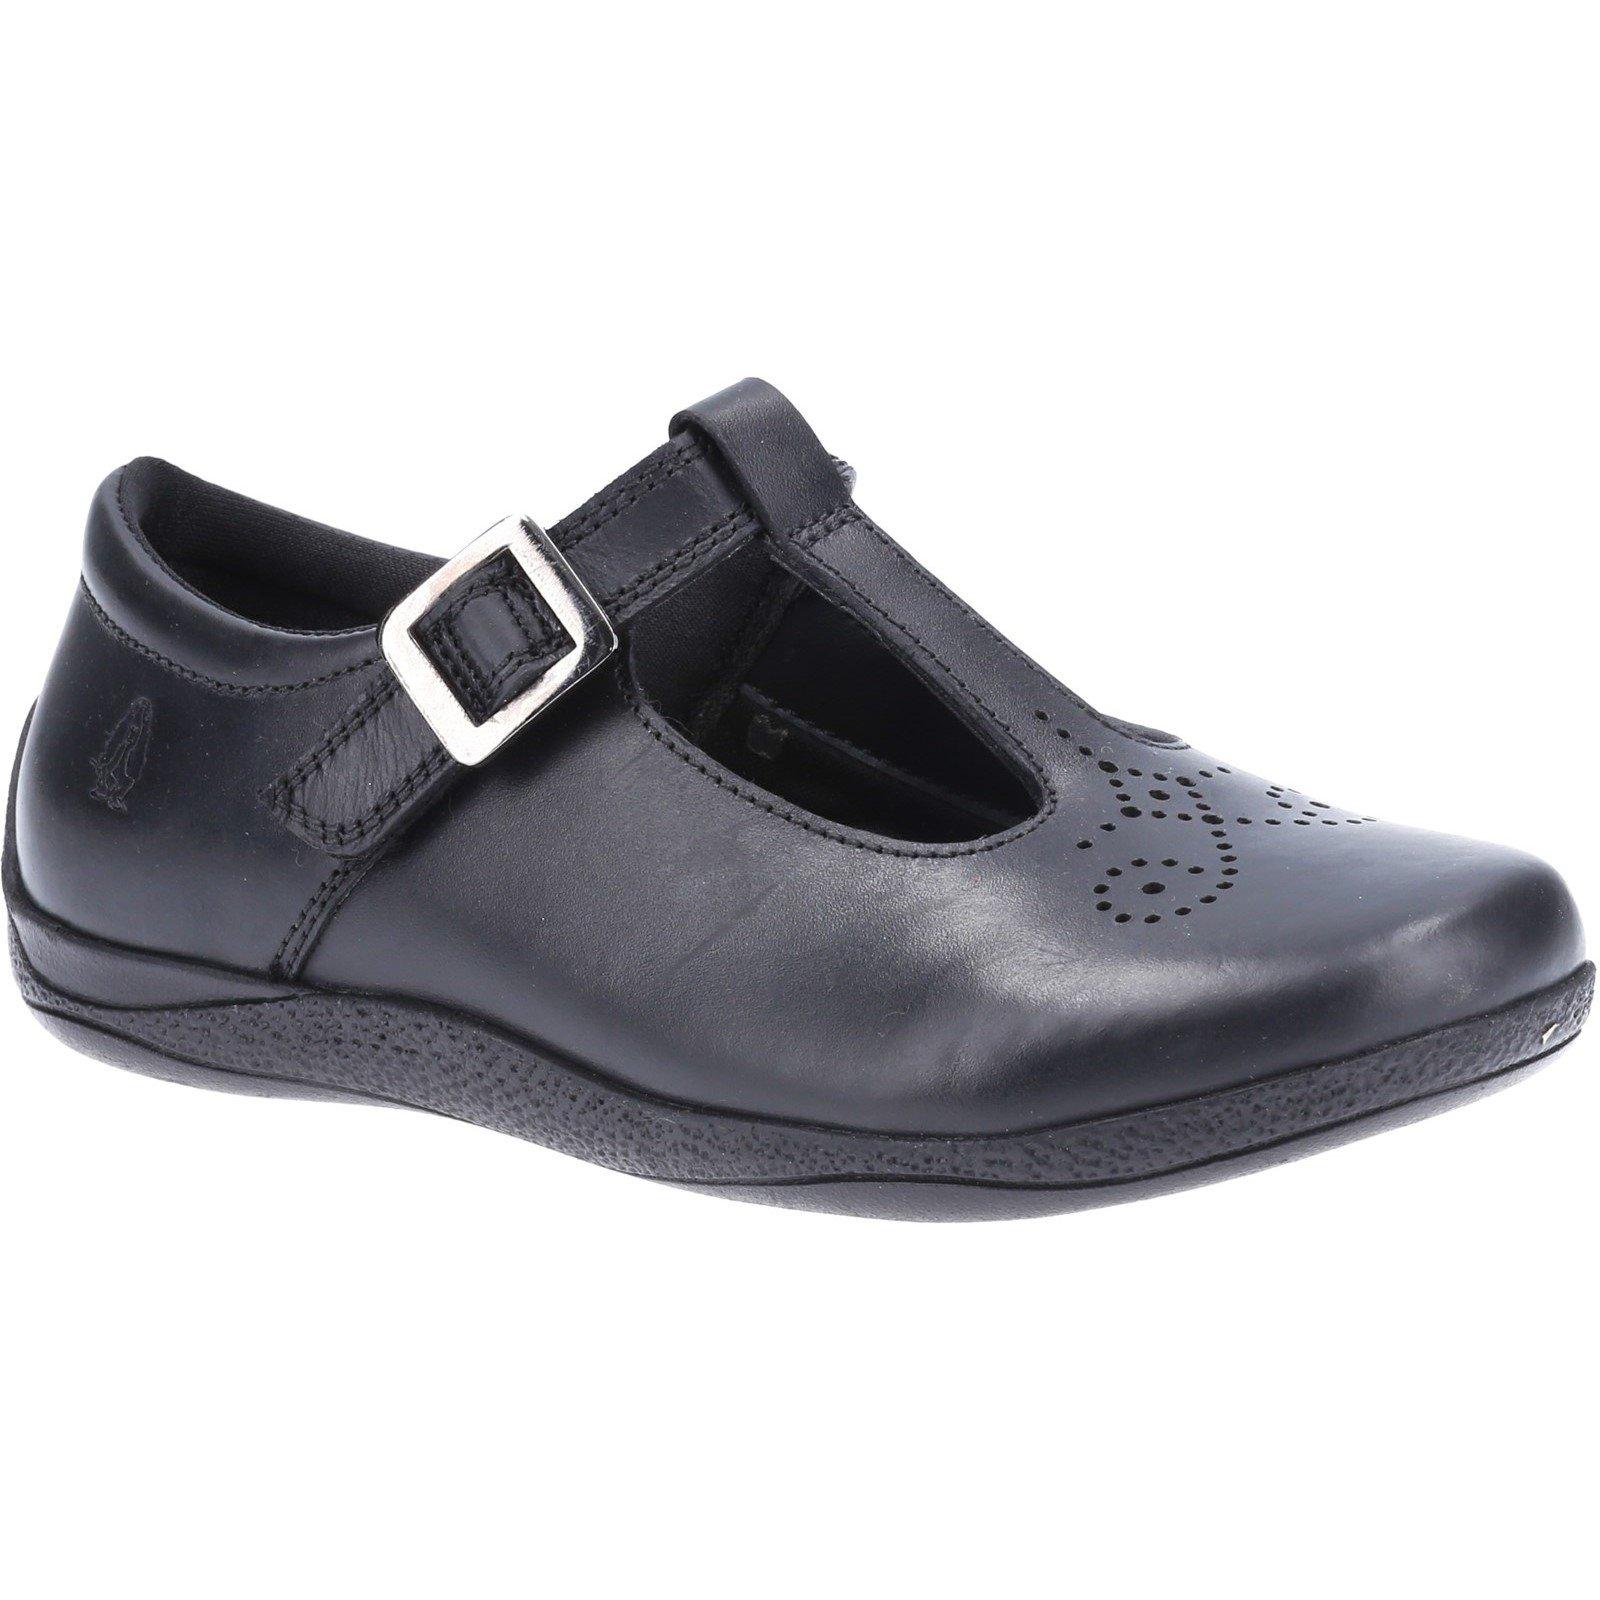 Hush Puppies Kid's Eliza Junior School Shoe Black 32589 - Black 12